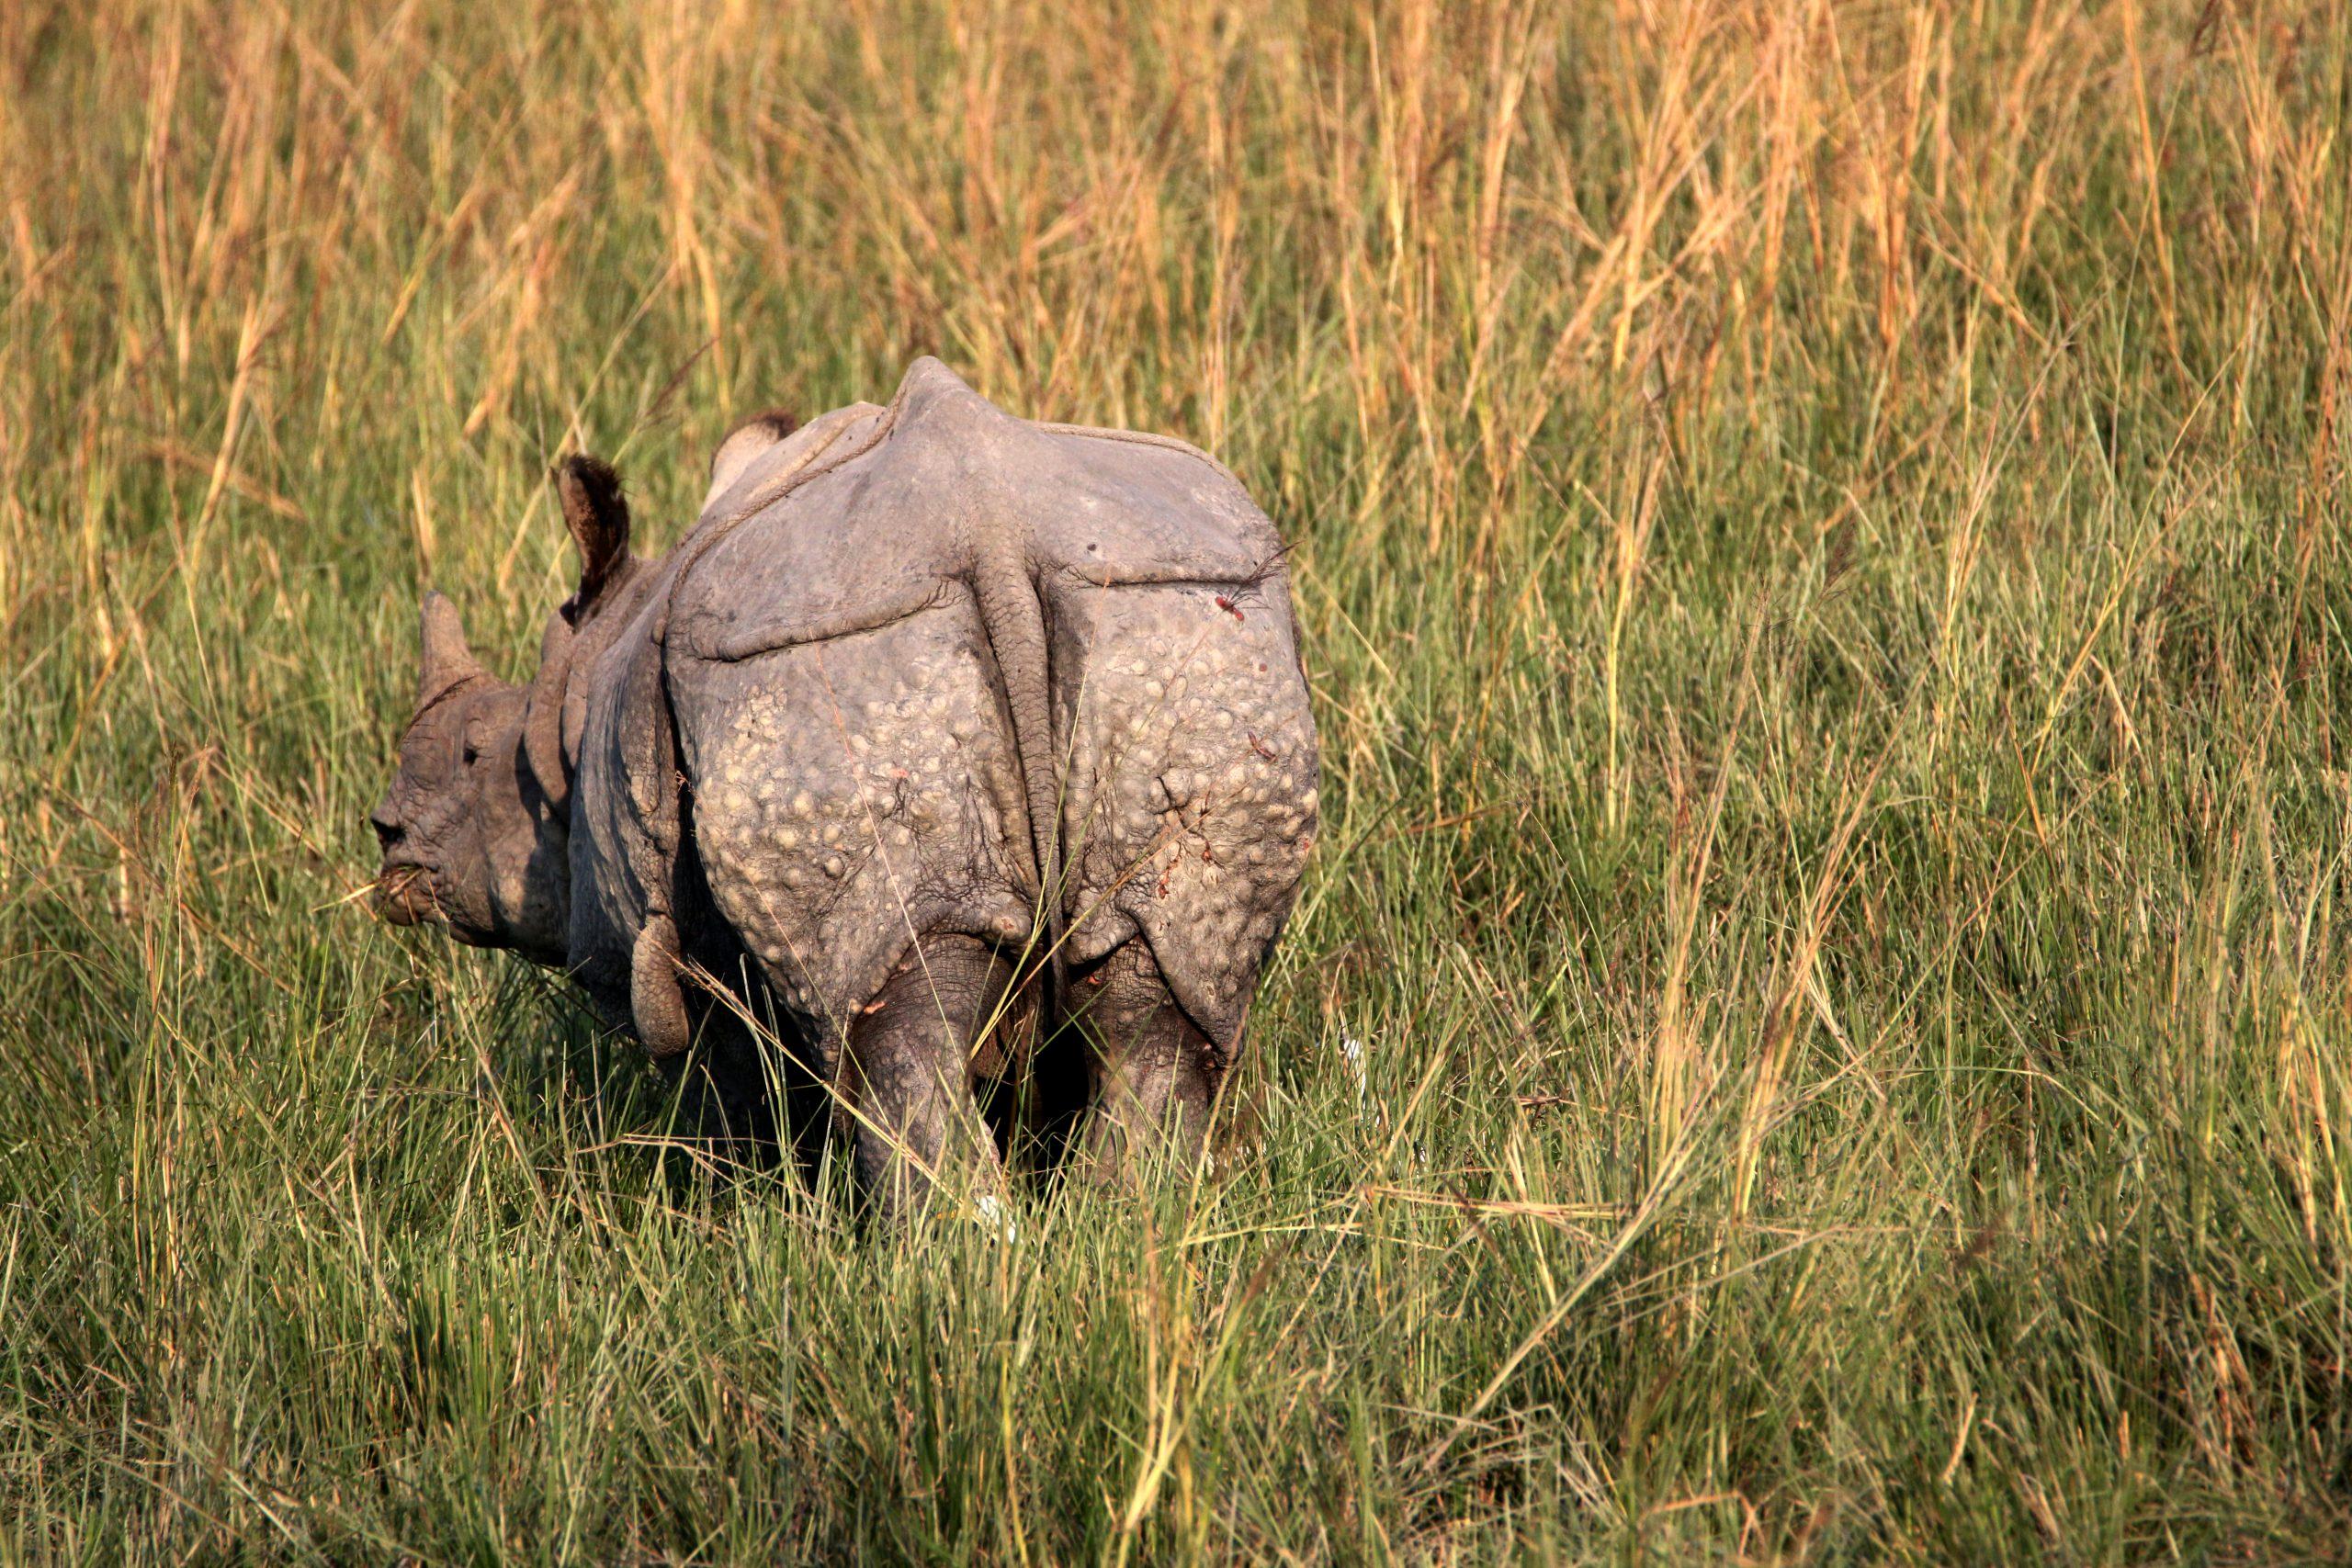 Grazing Indian Rhino